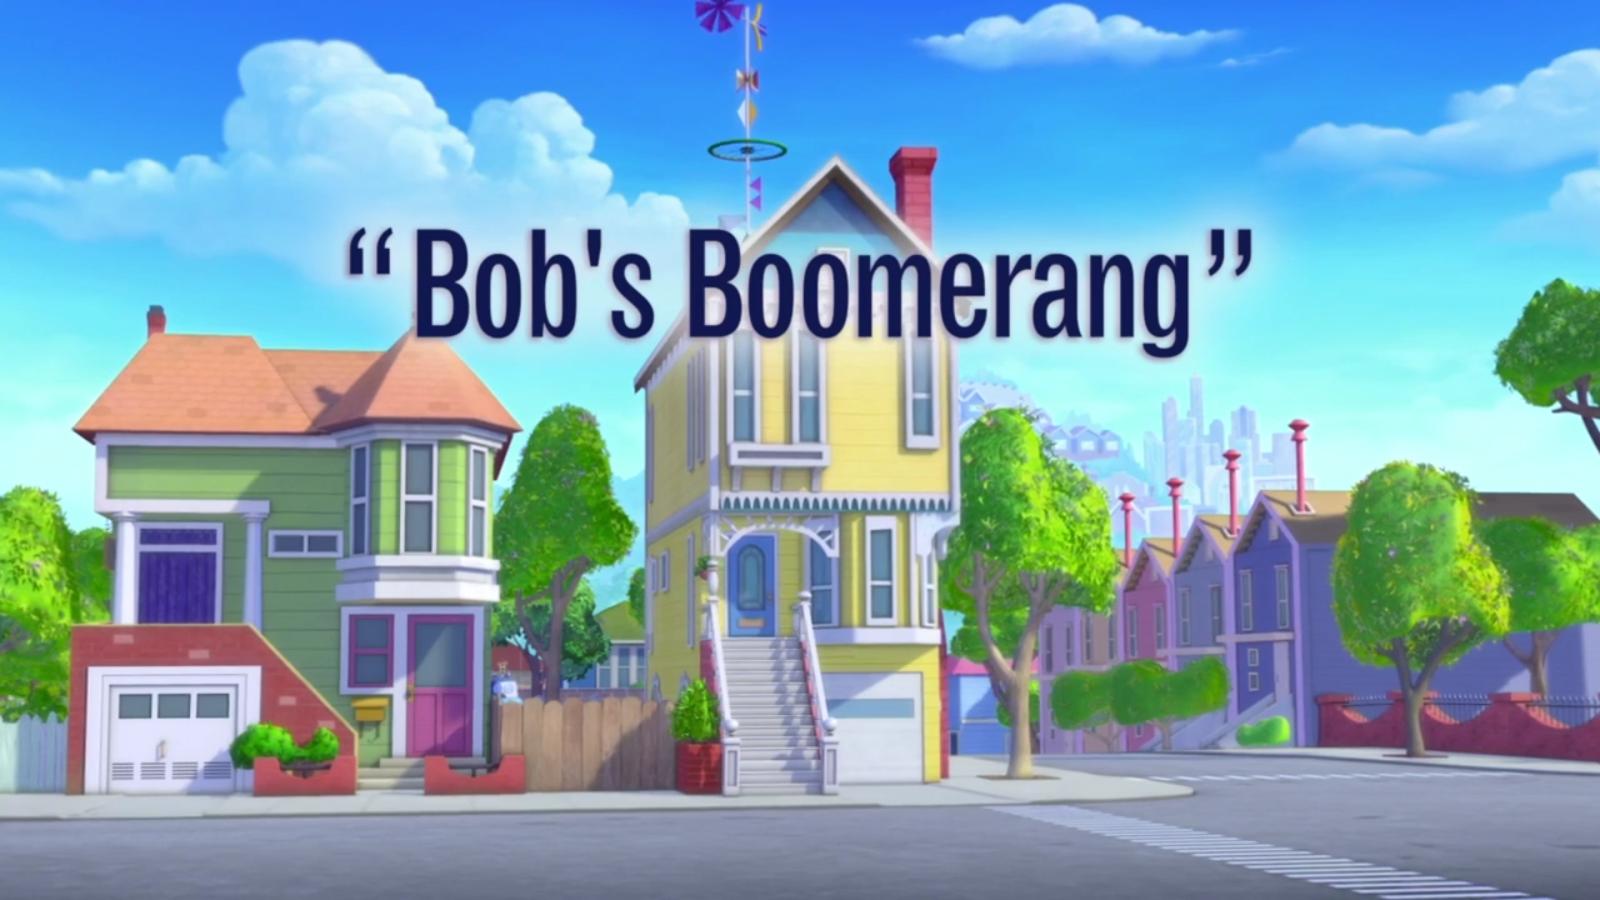 Bob's Boomerang